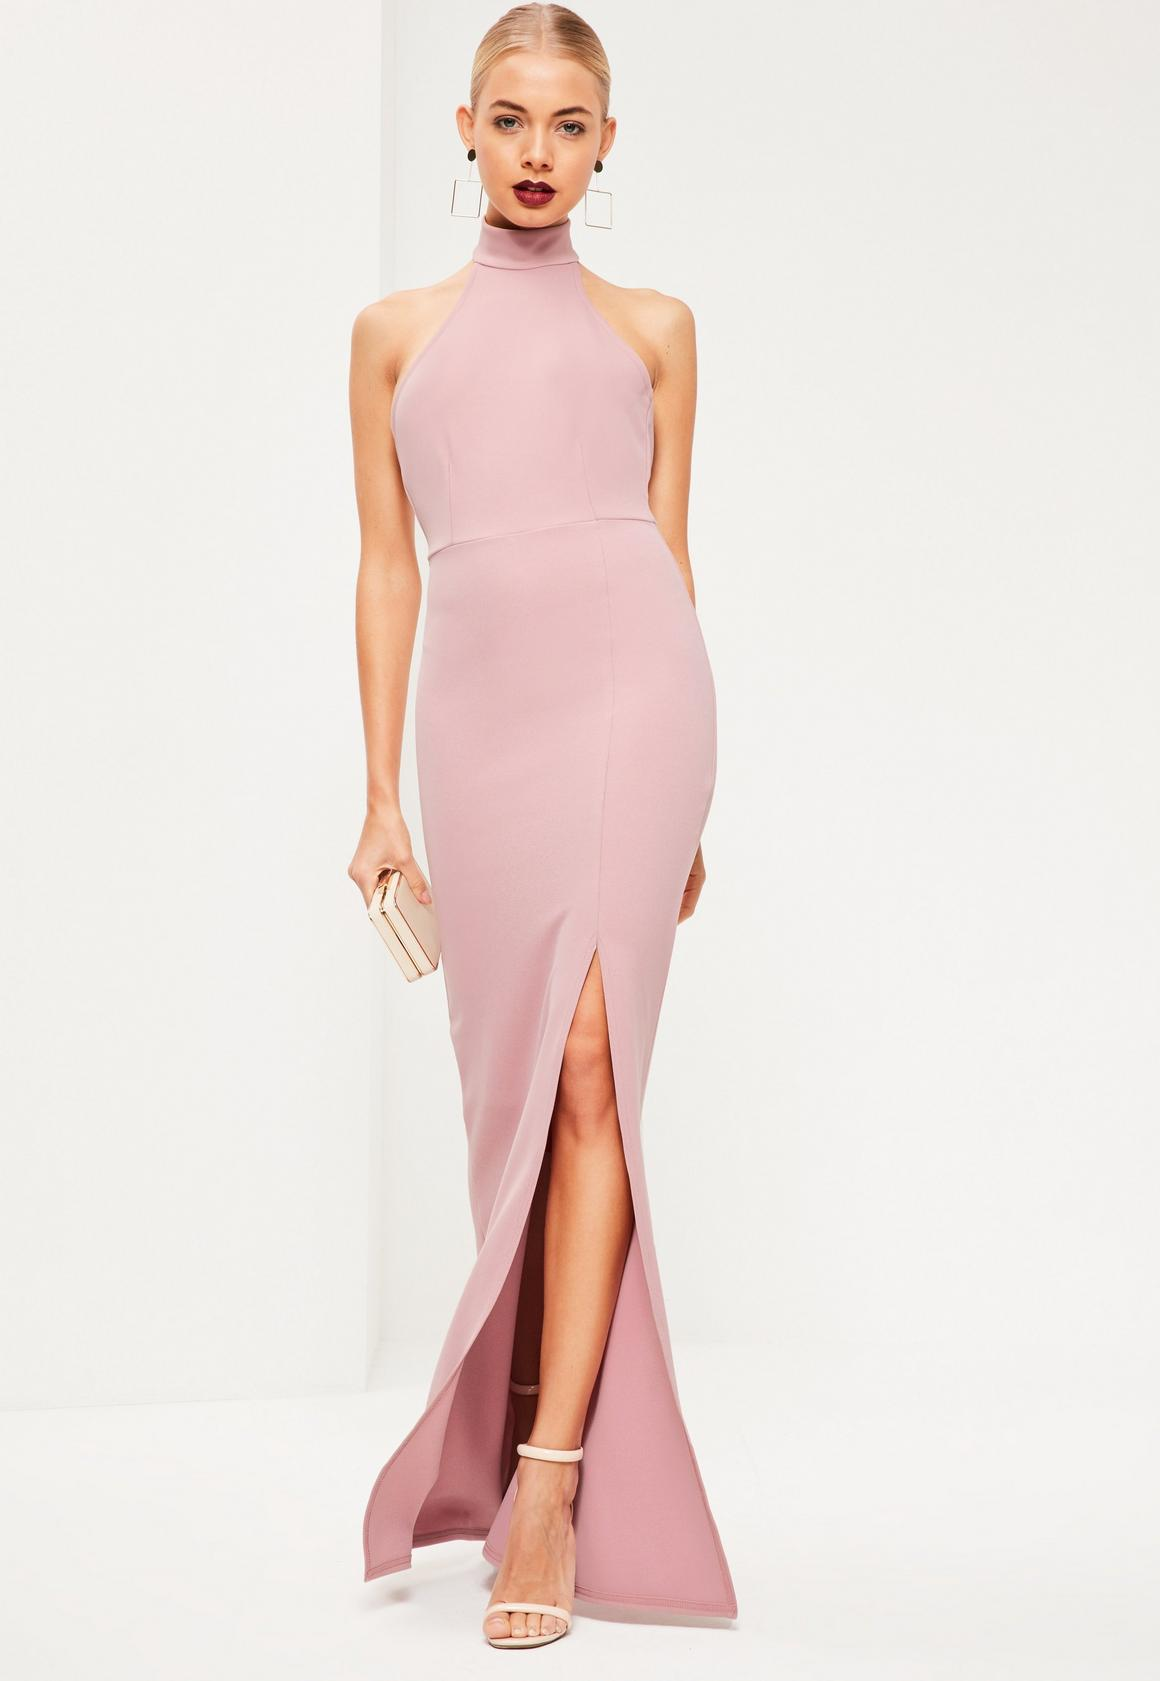 robe bustier bal de promo robe bal promo courte noire argent tulle bustier strass